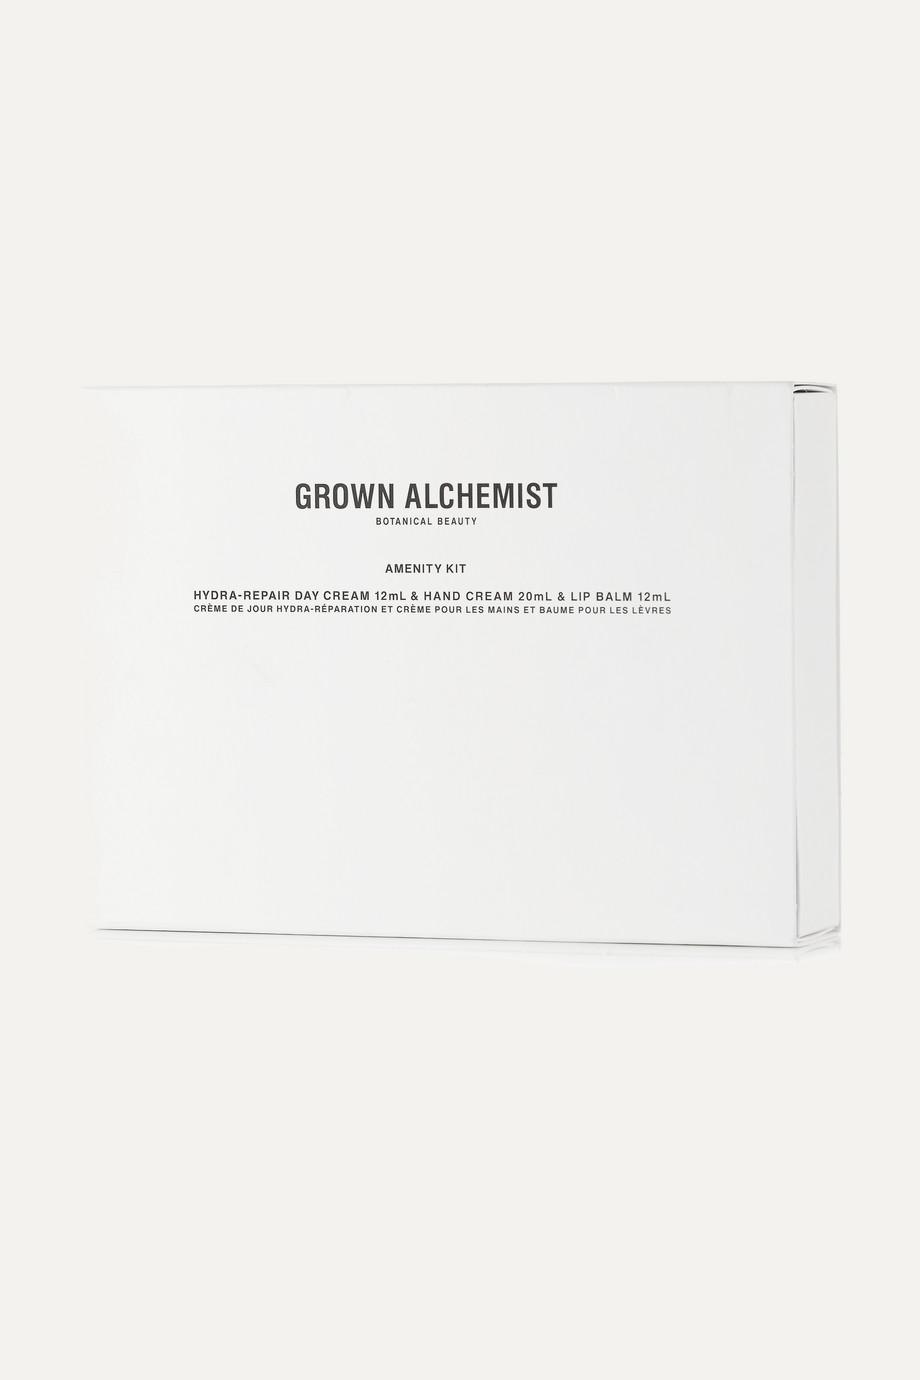 Grown Alchemist Amenity Kit